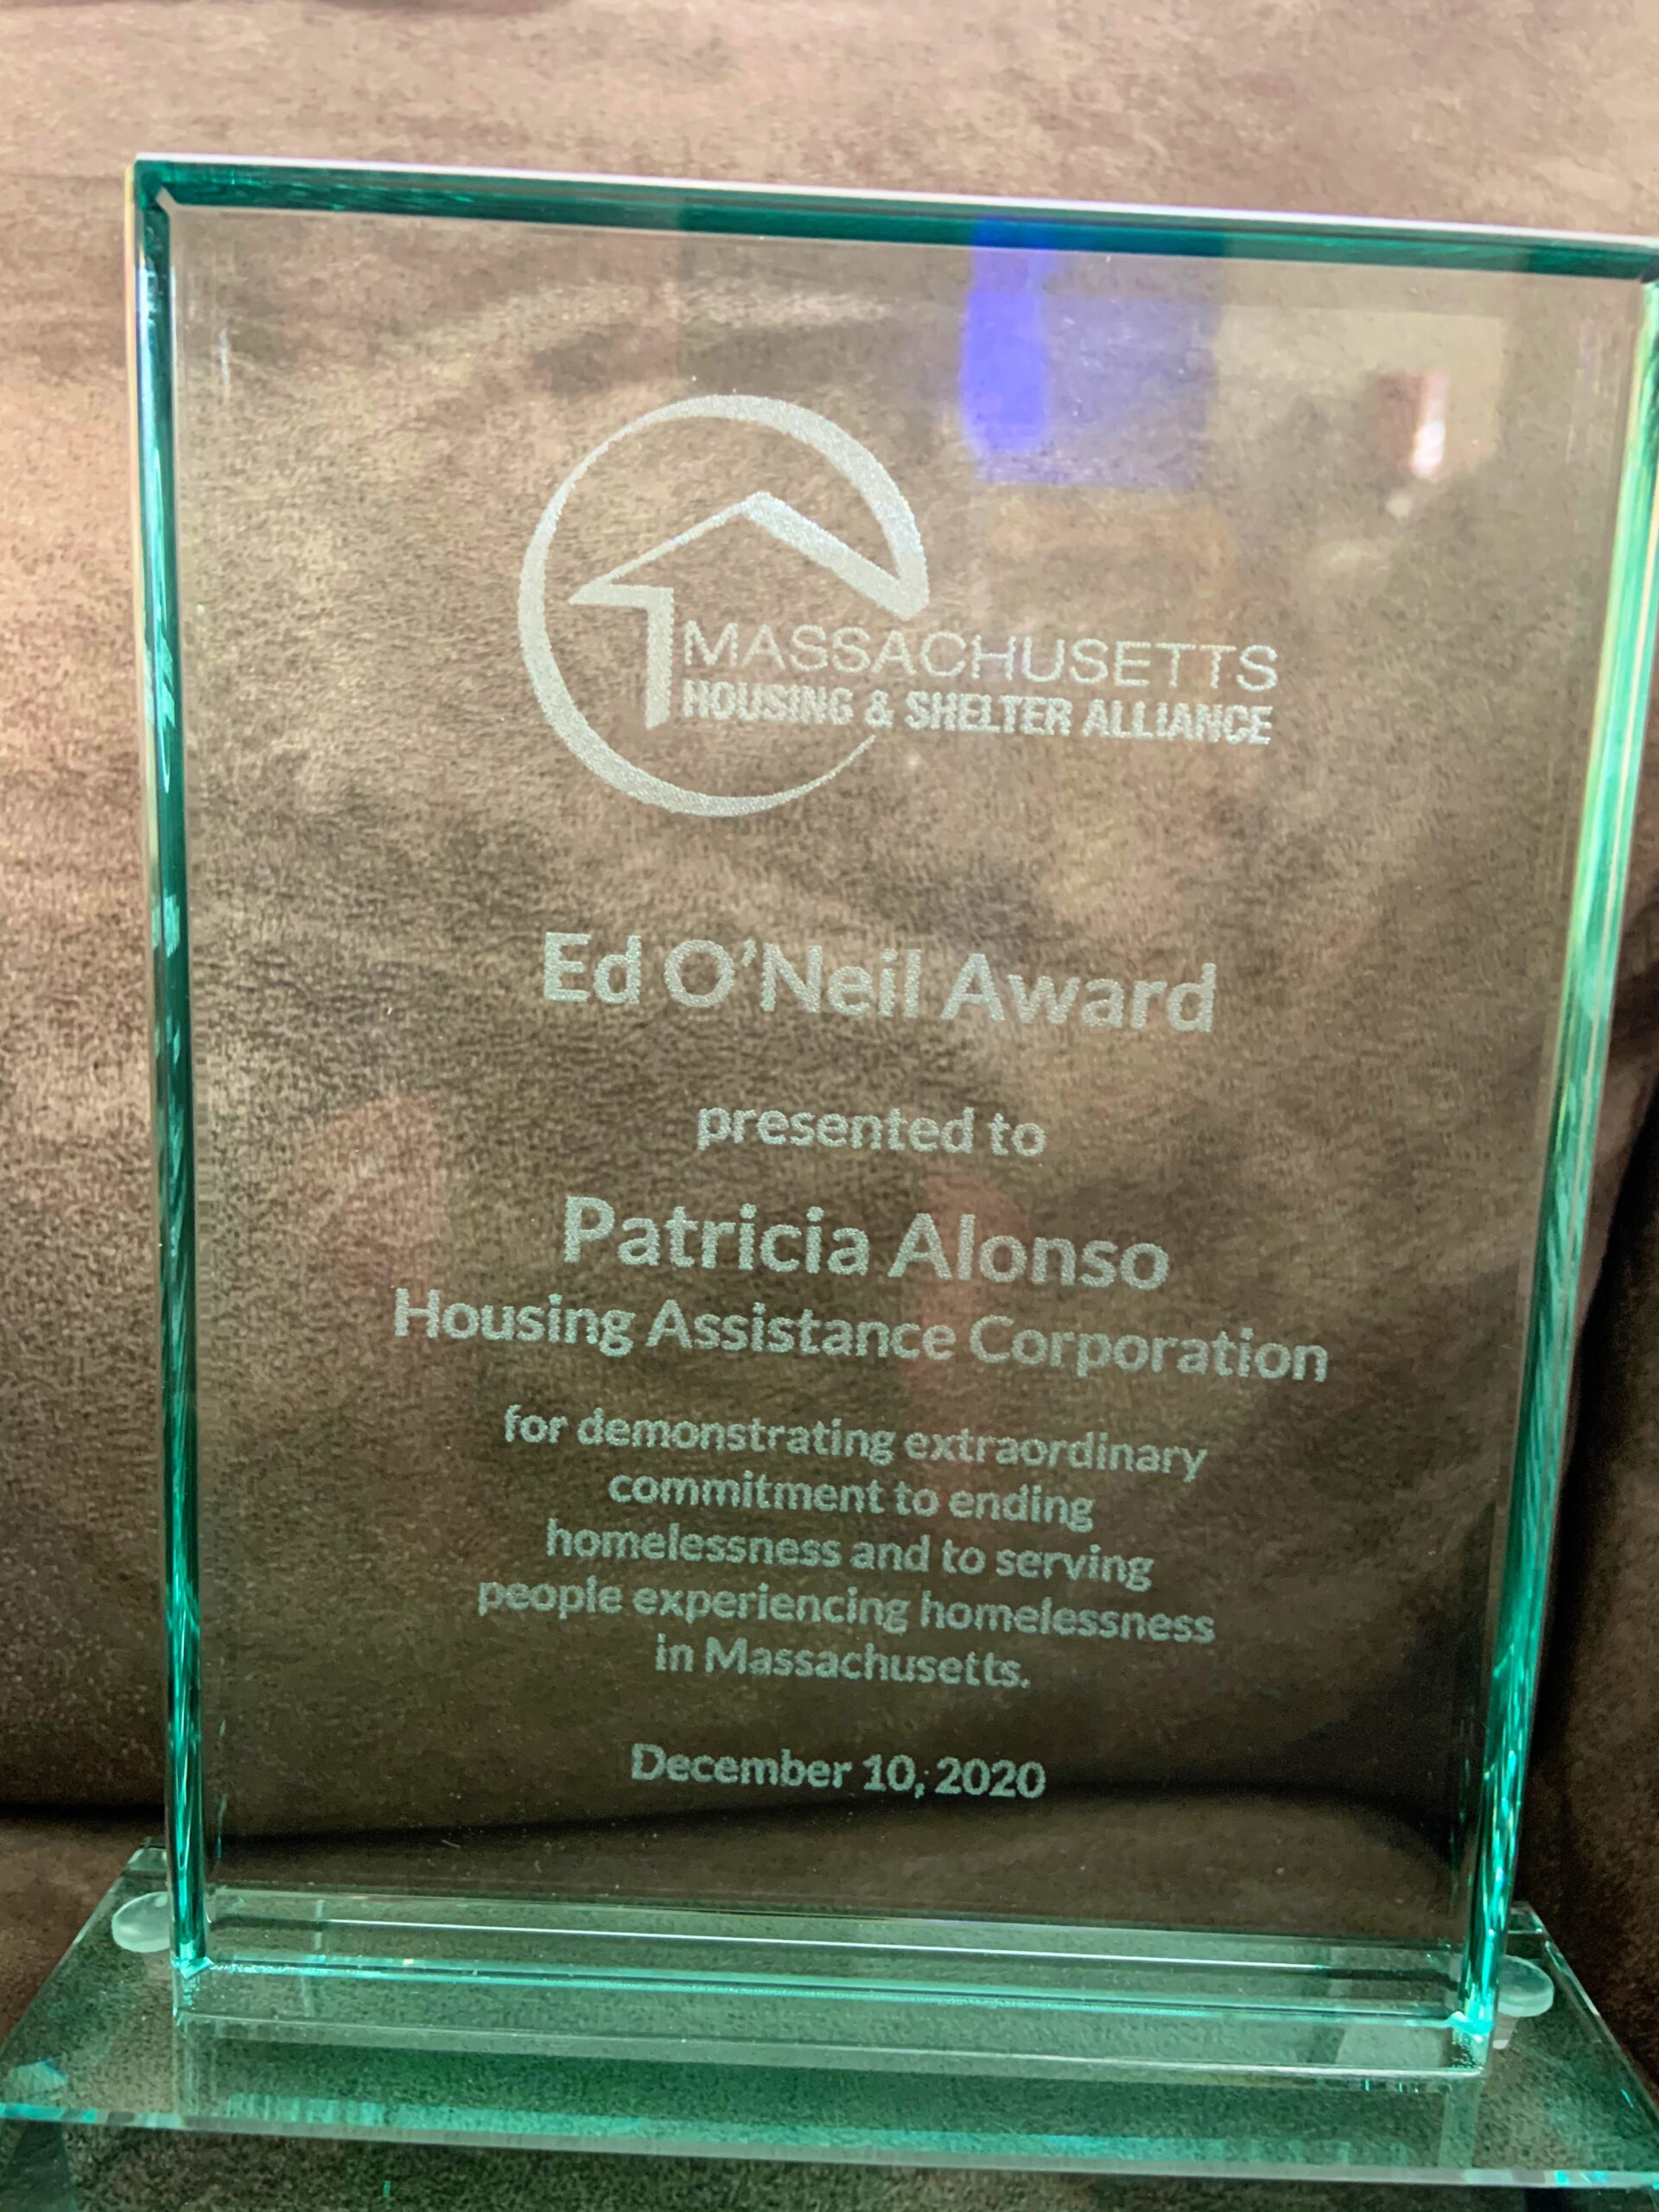 Patty Alonso's Ed O'Neil Award